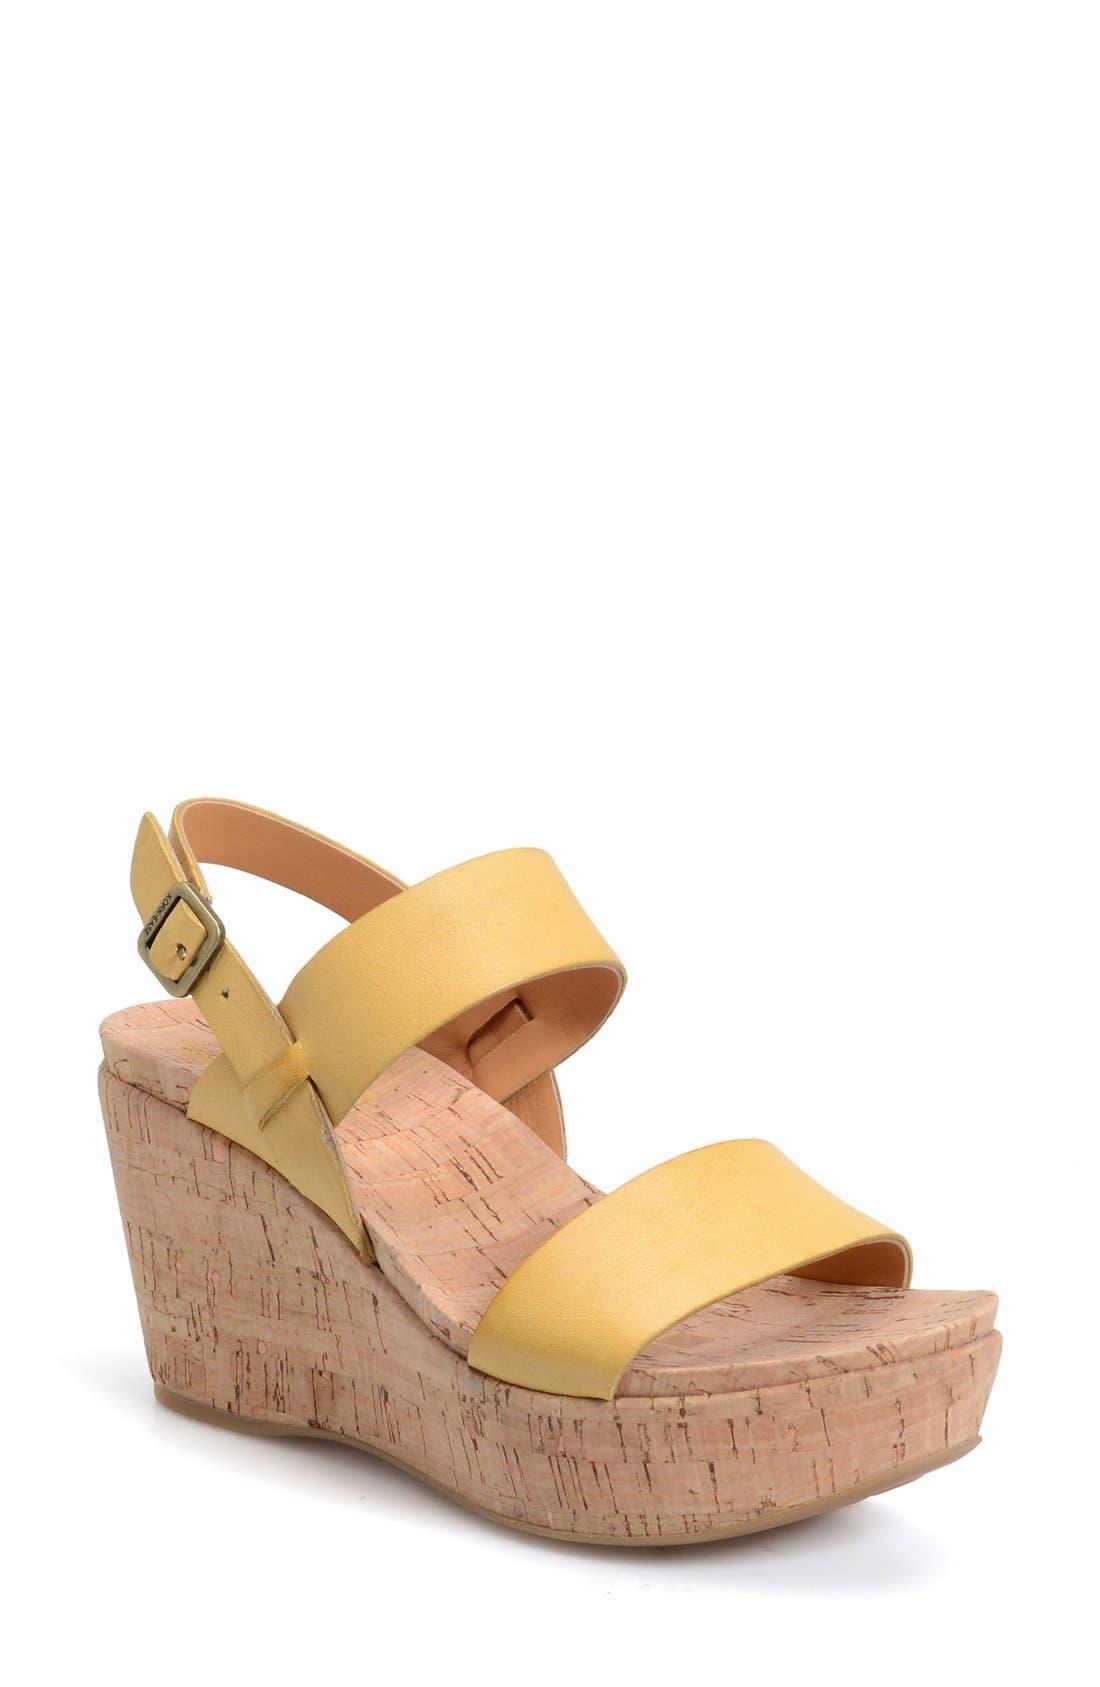 'Austin' Slingback Wedge Sandal,                             Main thumbnail 10, color,